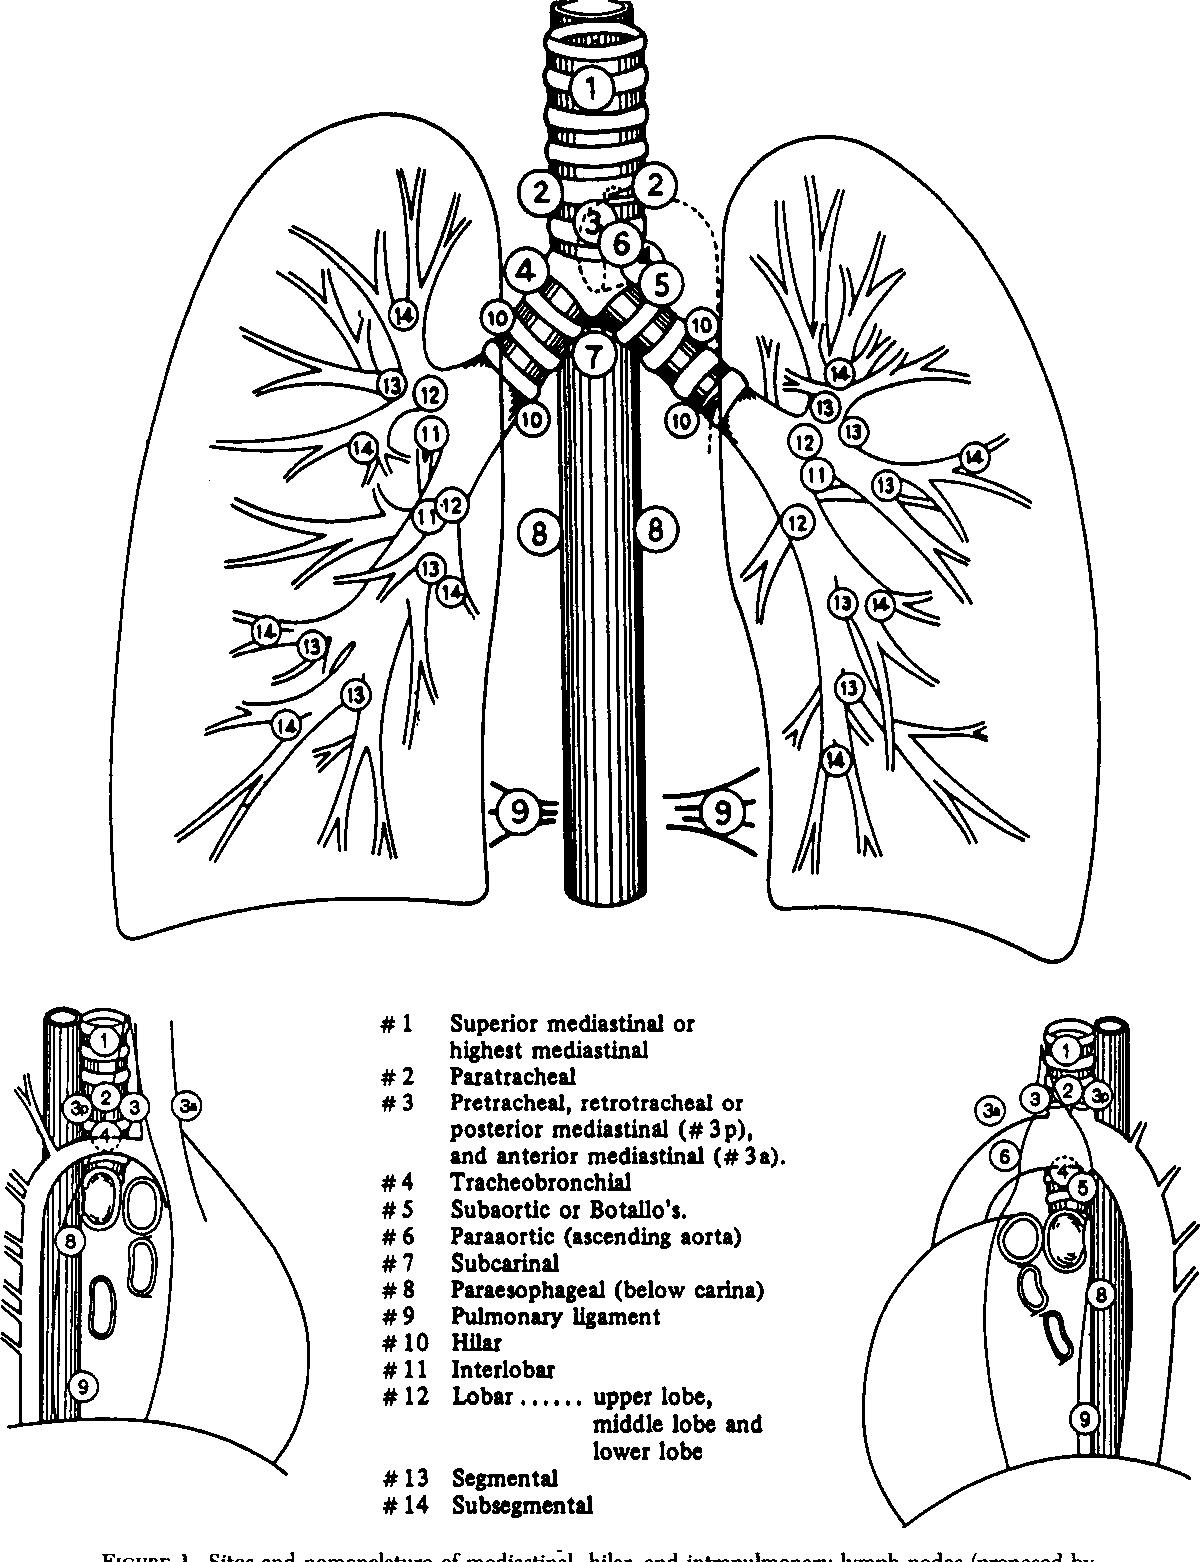 Figure 1 From Mediastinal Spread Of Metastatic Lymph Nodes